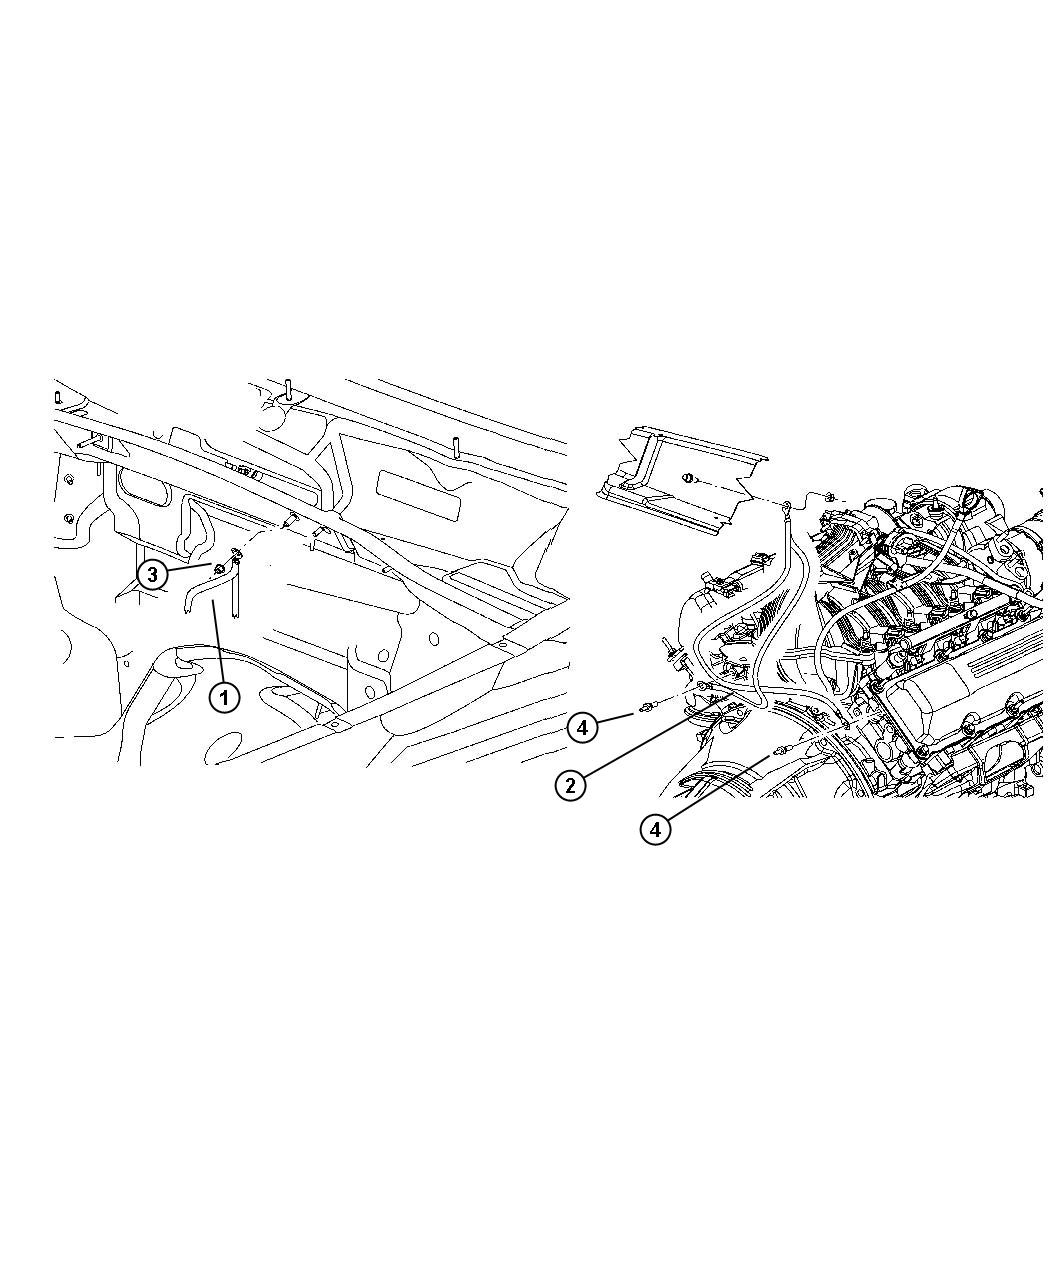 Jeep Liberty Strap Engine Ground Enginebodyhood